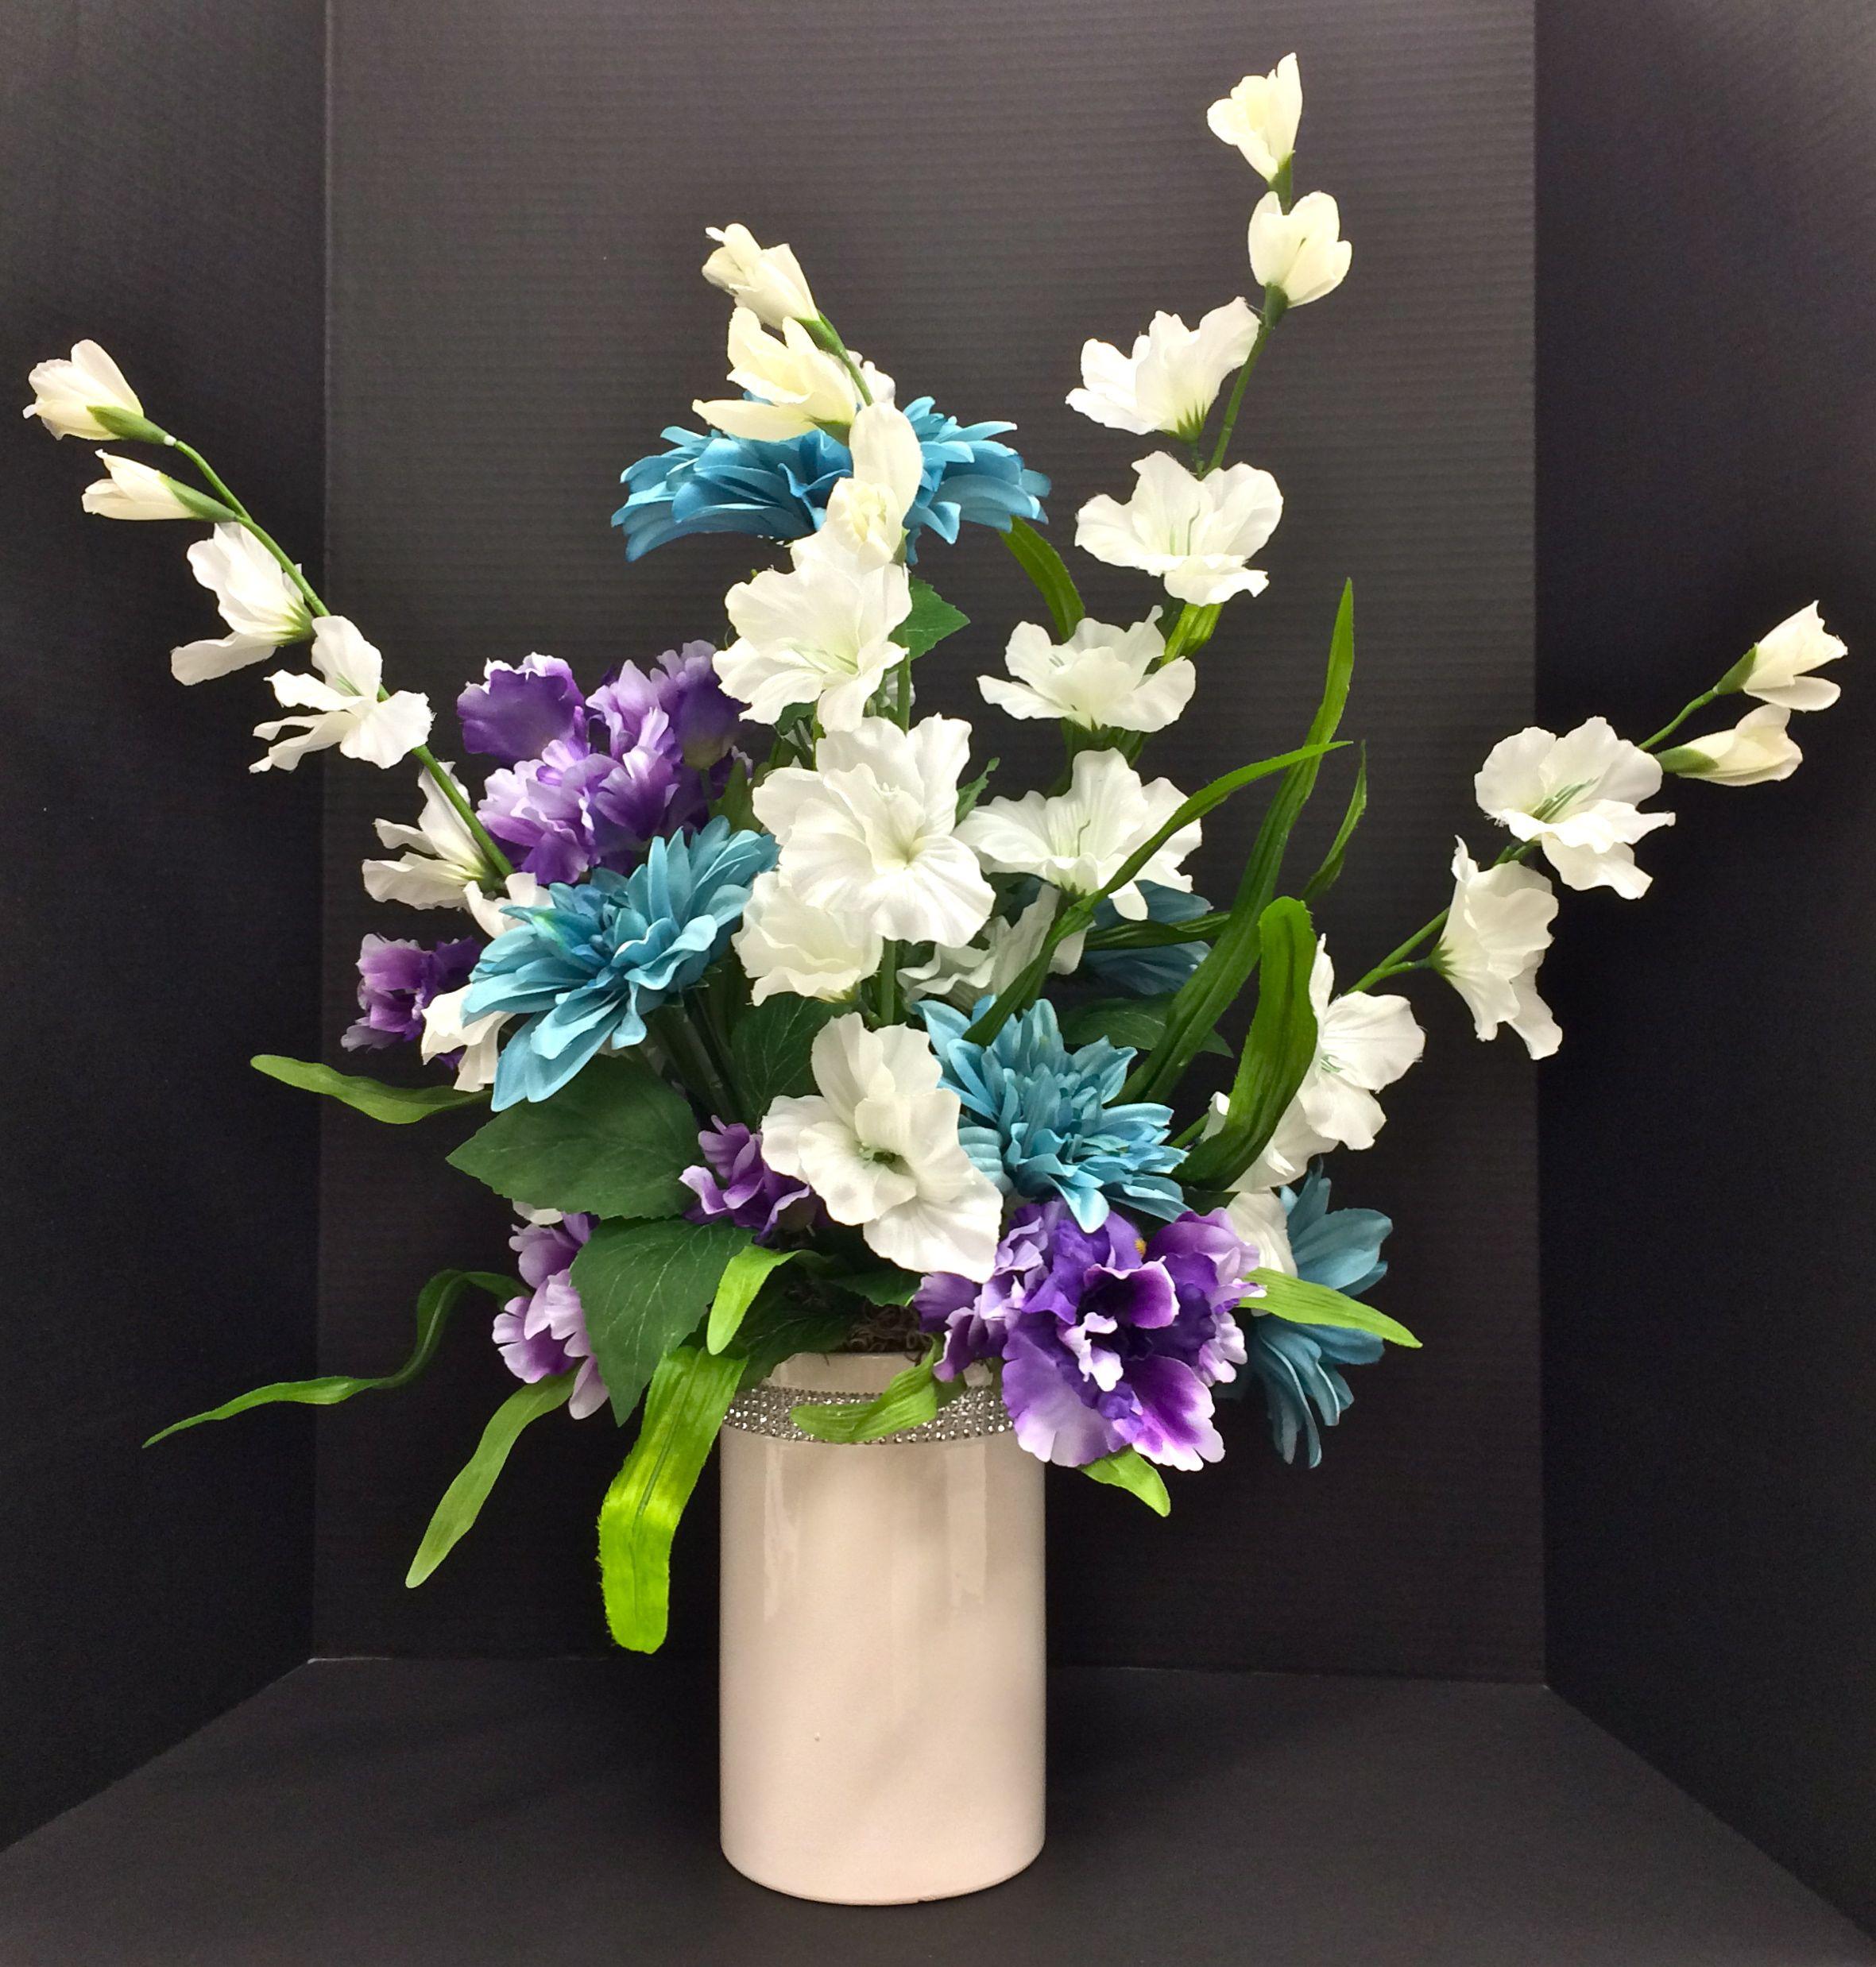 Spring 2015 Season tabletop: Blue Dahlias, White Gladiolus and Violet Iris on 8 inch ceramic jeweled white cylinder vase. Original design and arrangement by http://nfmdesign.synthasite.com/